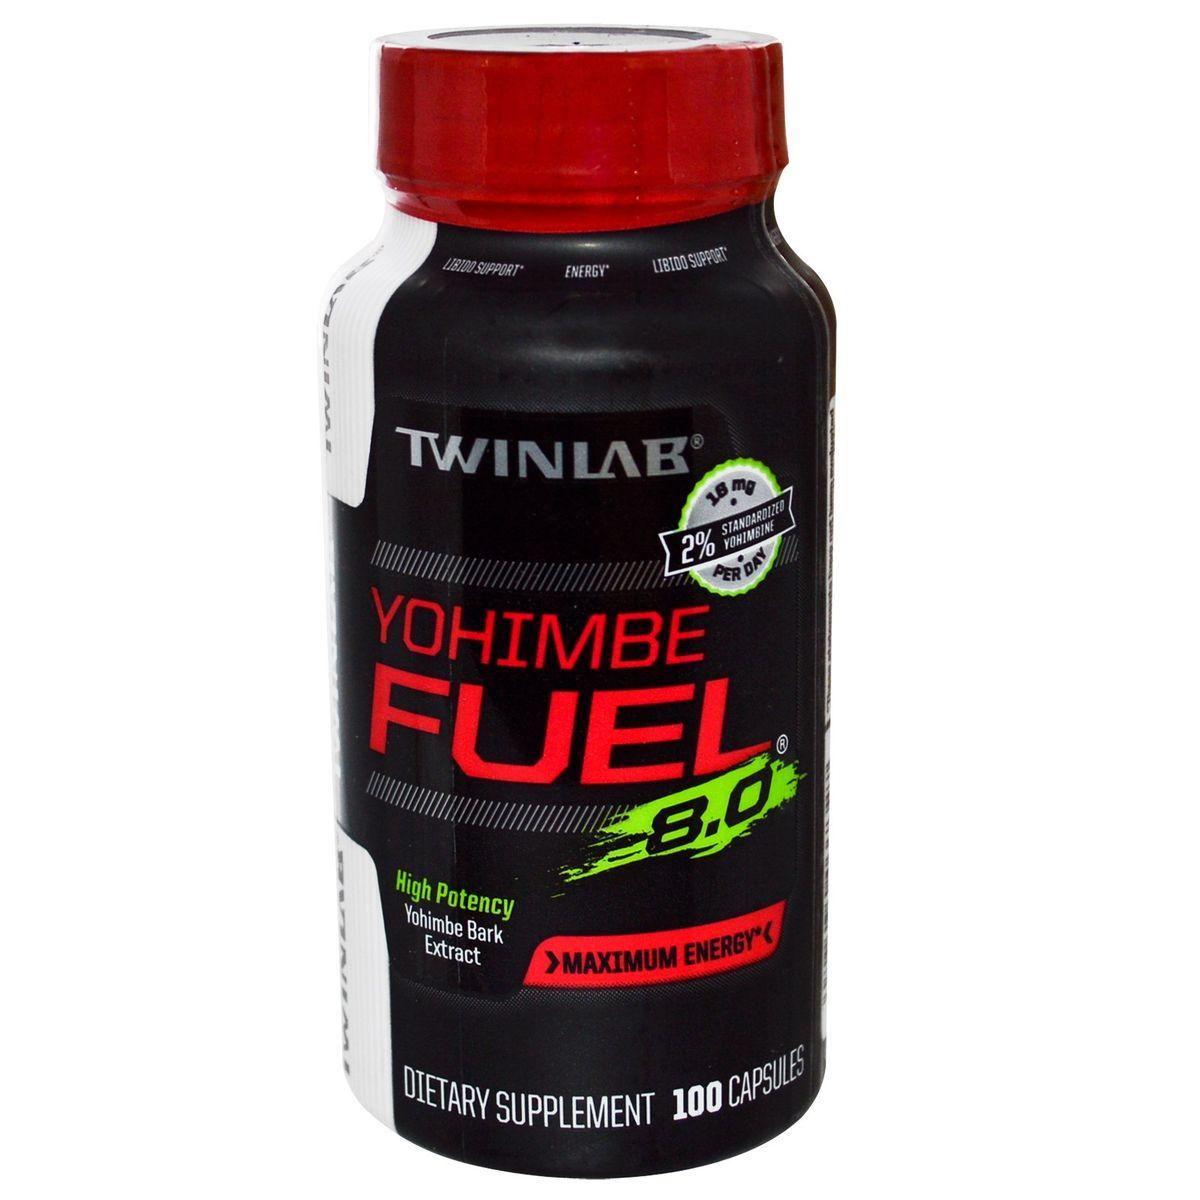 Средства для повышения тестостерона Twinlab YOHIMBE FUEL, 100 капсул ( 0027434037327 )